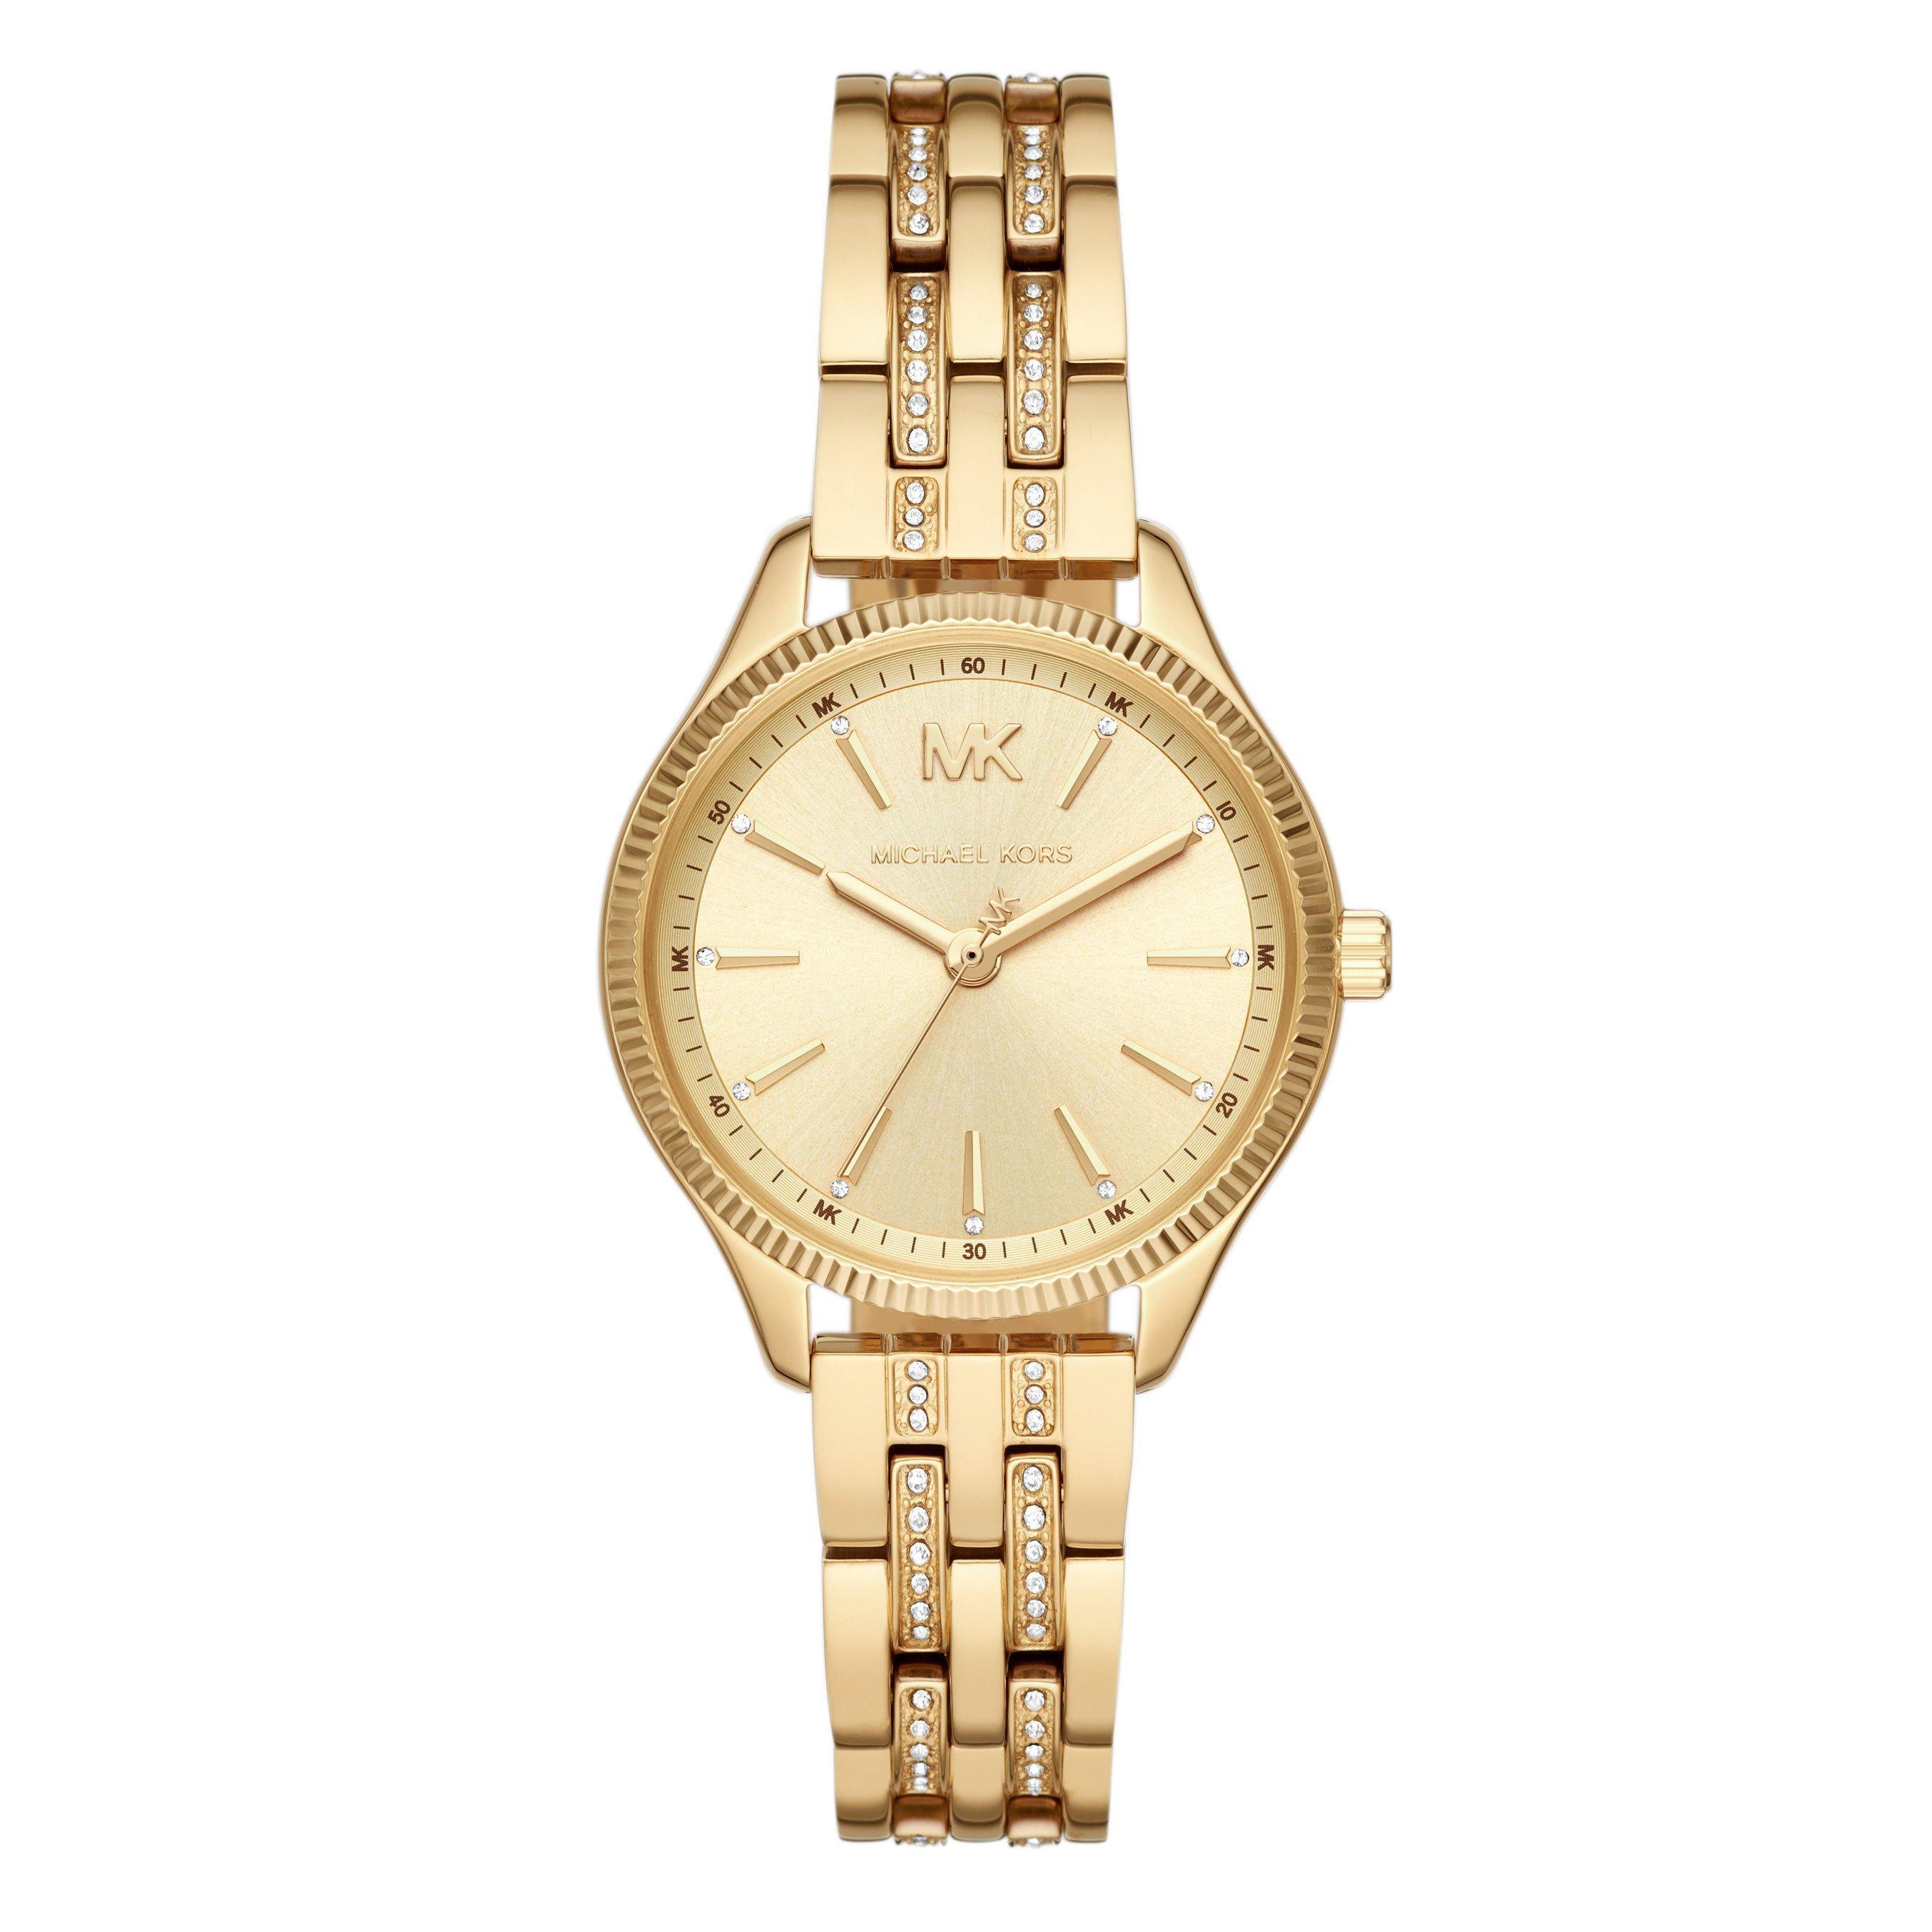 Michael Kors Lexington Gold Plated Ladies Watch